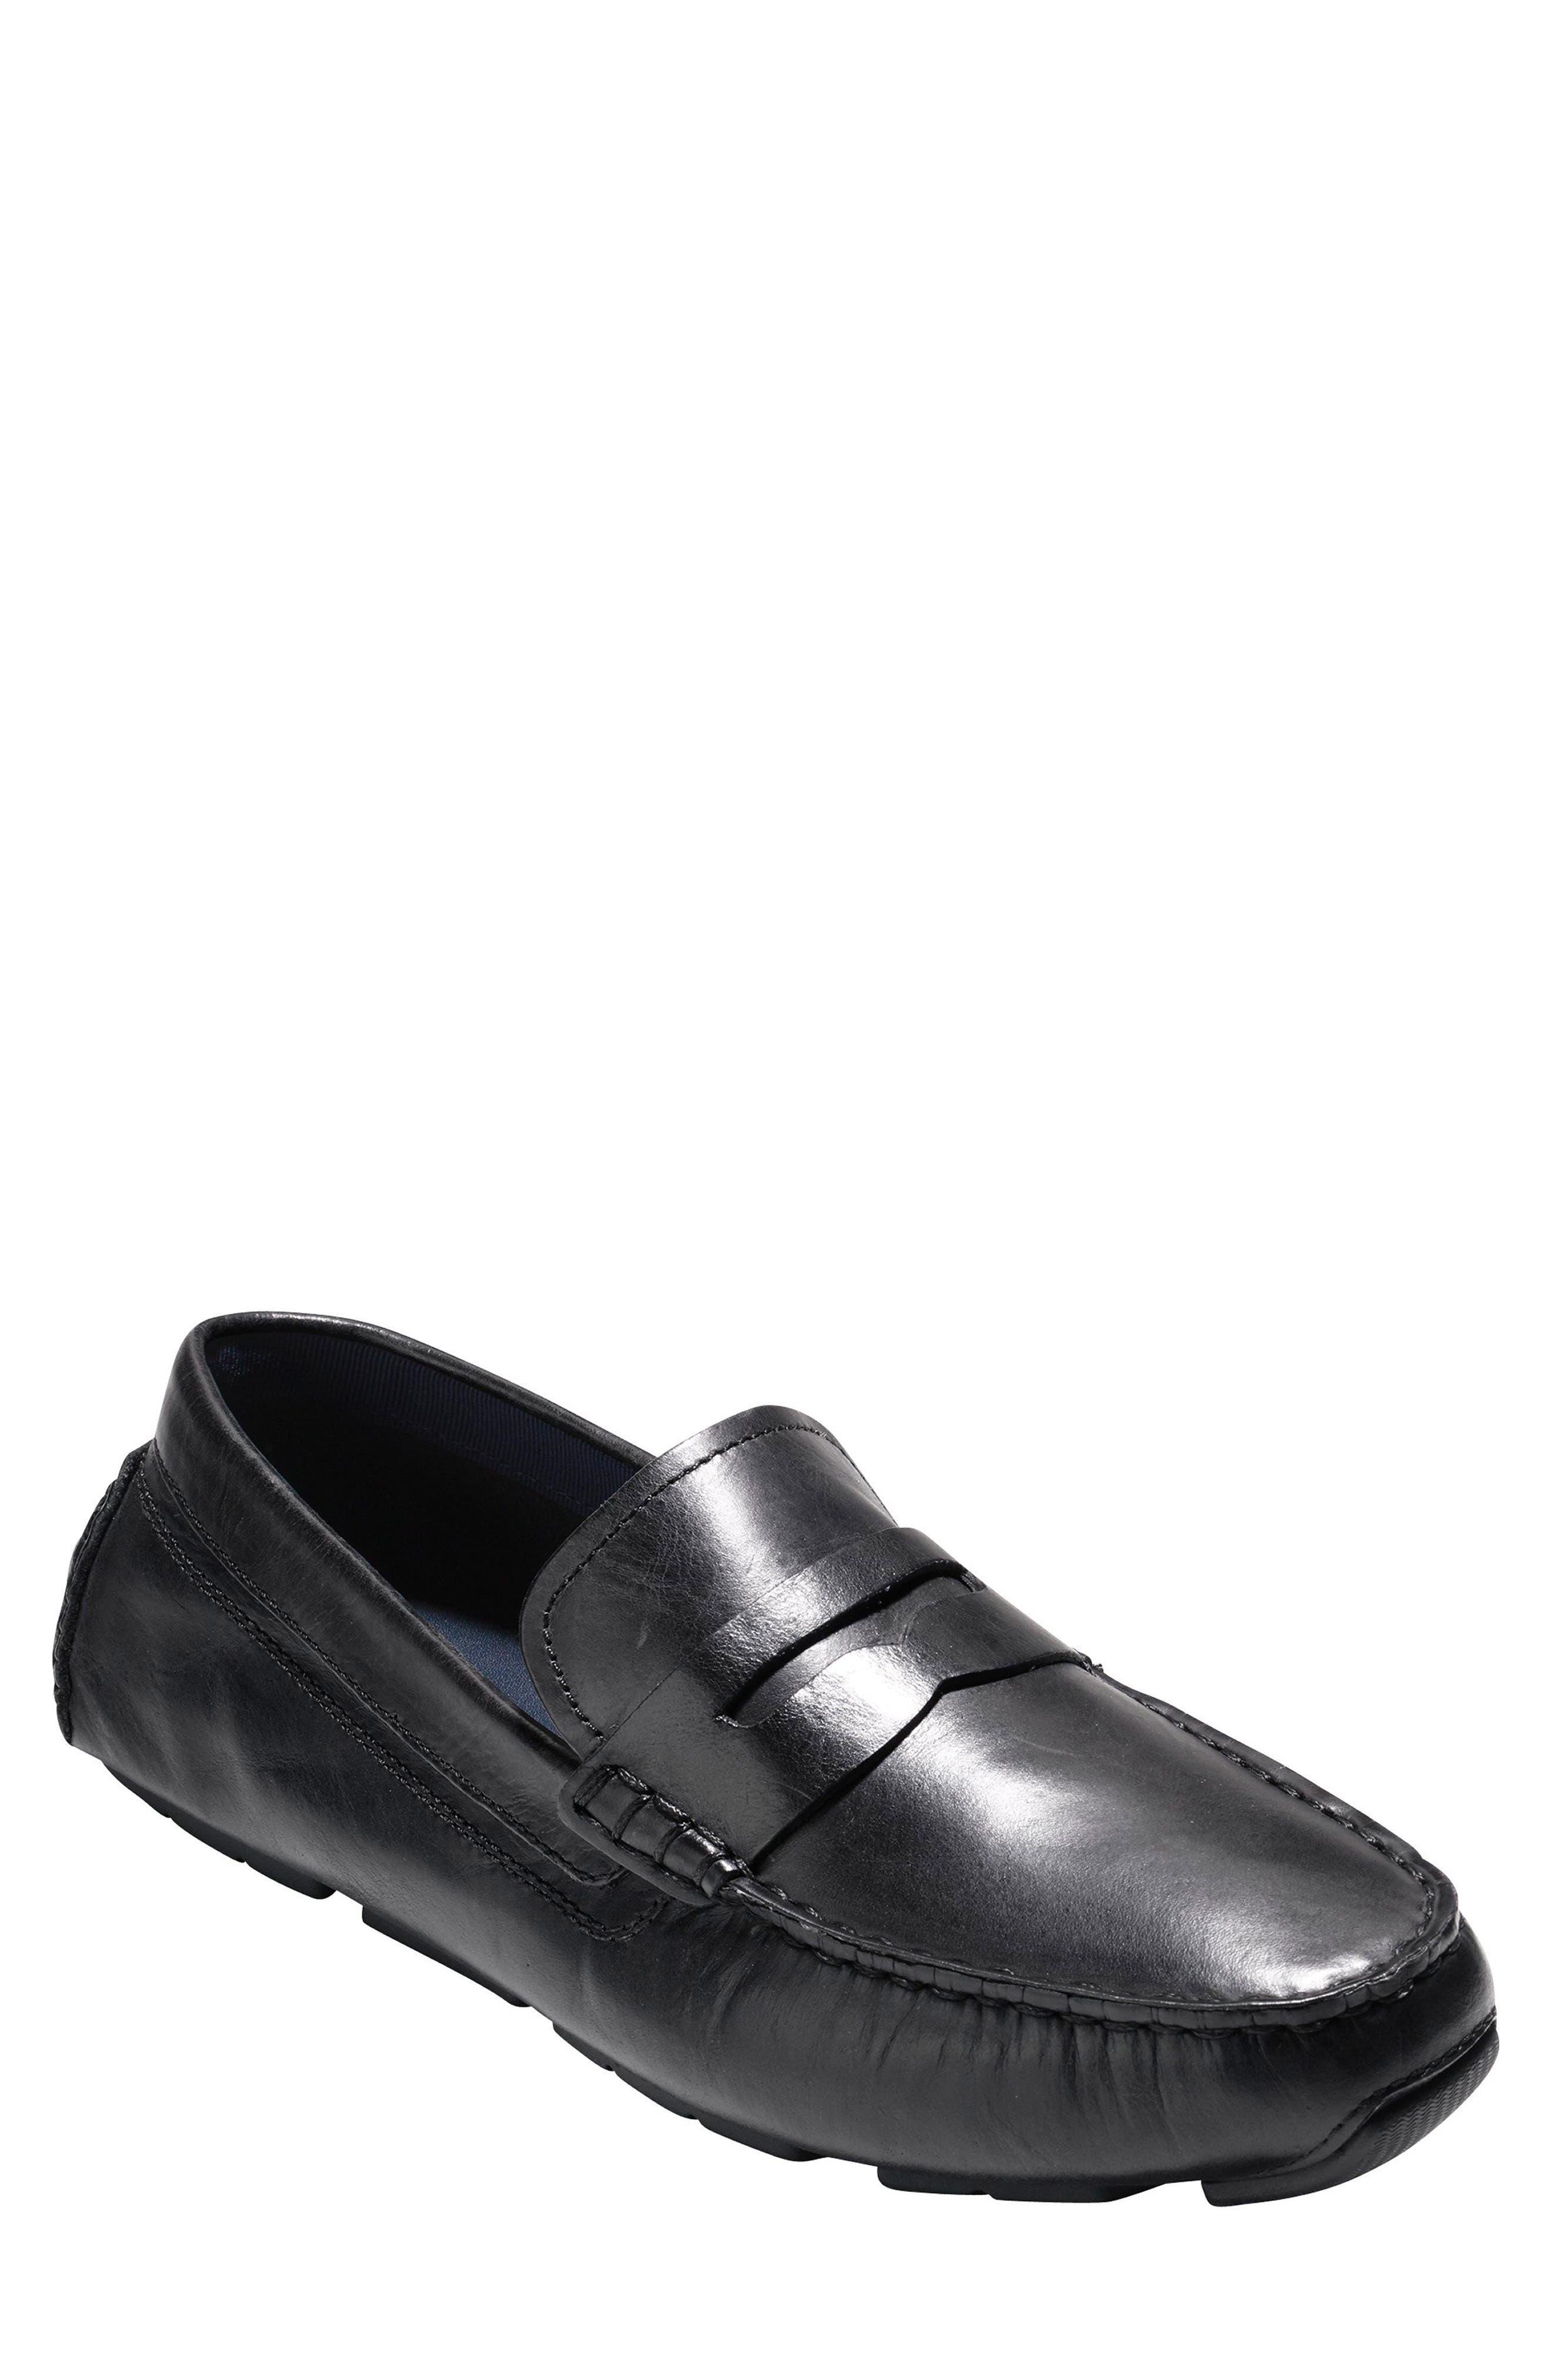 Kelson Driving Shoe,                             Main thumbnail 1, color,                             Black